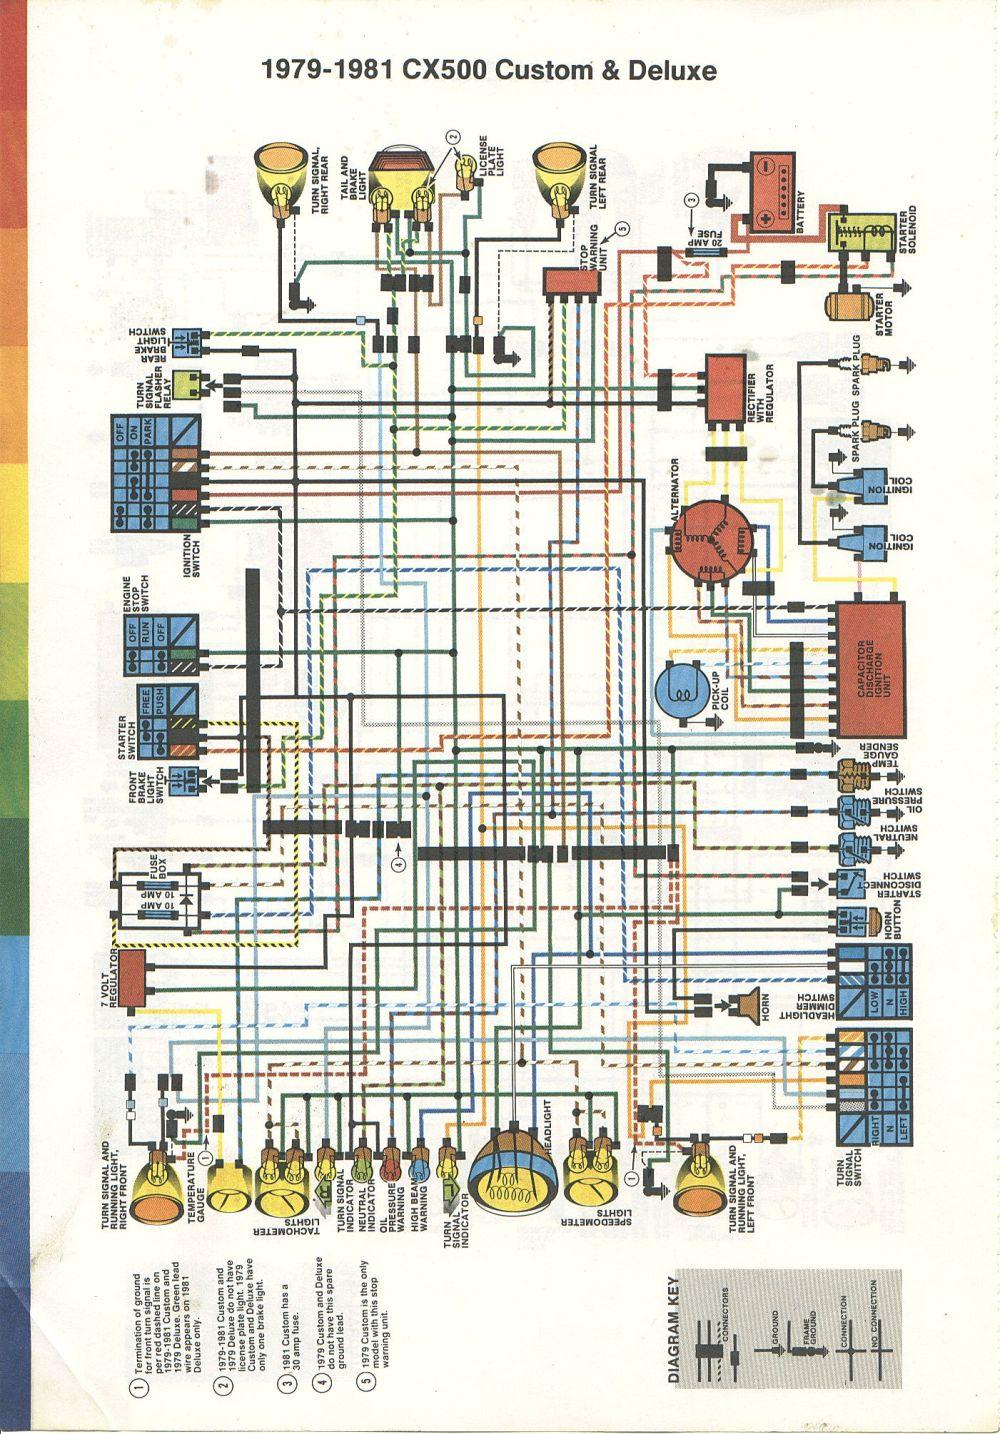 medium resolution of honda cx500 wiring diagram wiring diagrams favorites 1981 honda cx500 custom wiring diagram